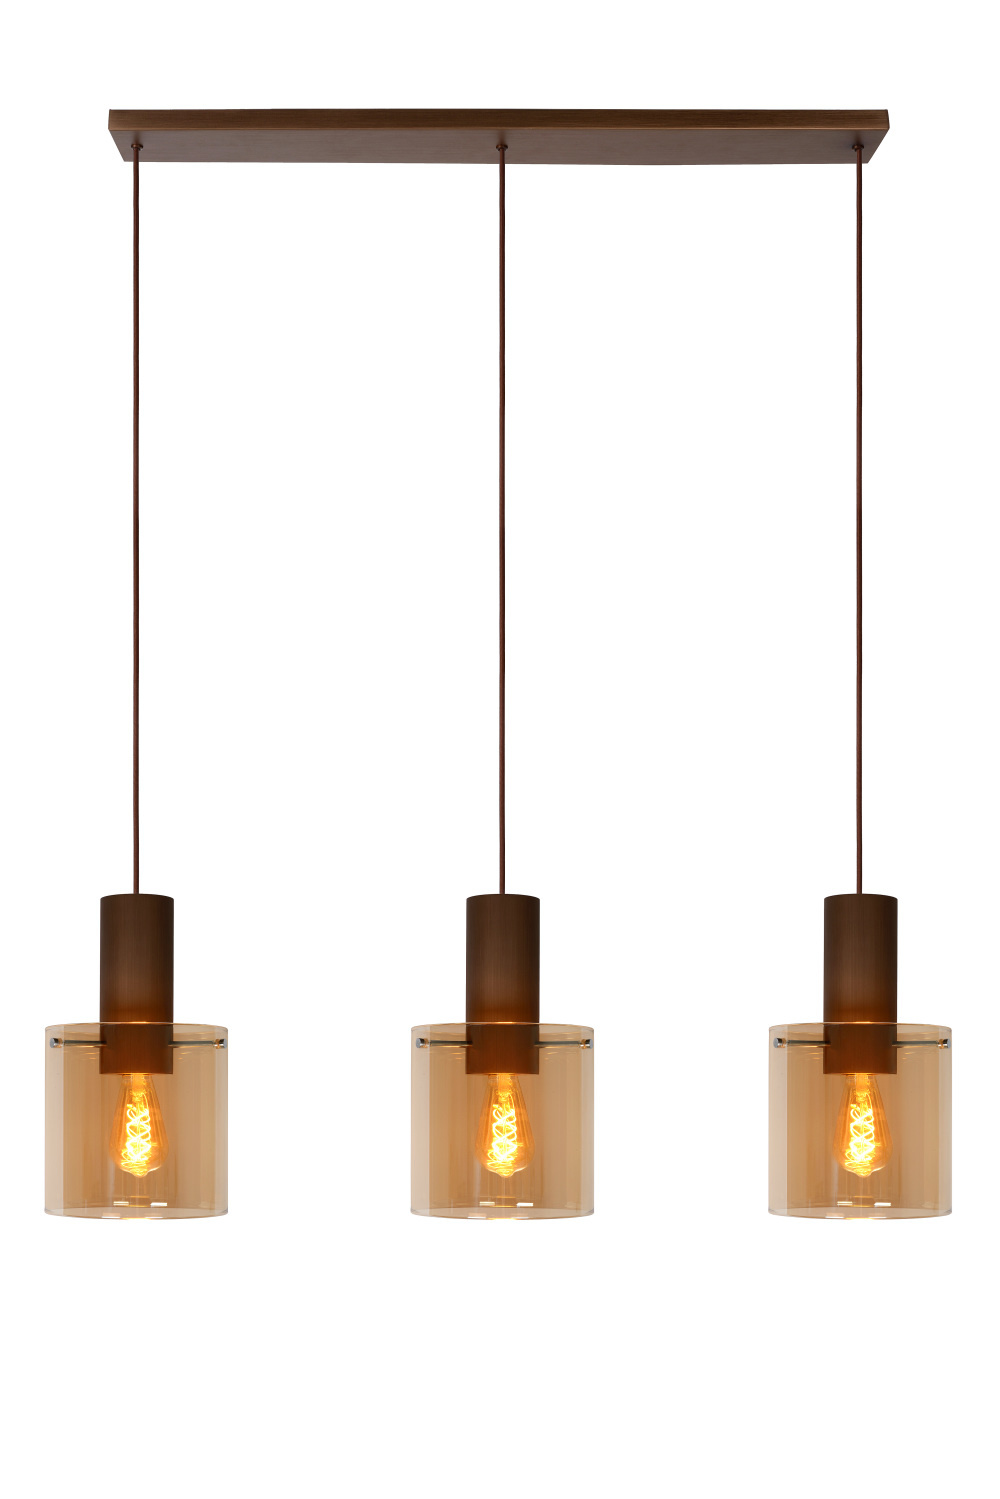 Lucide TOLEDO Hanglamp-Amber-Ø20-3xE27-40W-Glas